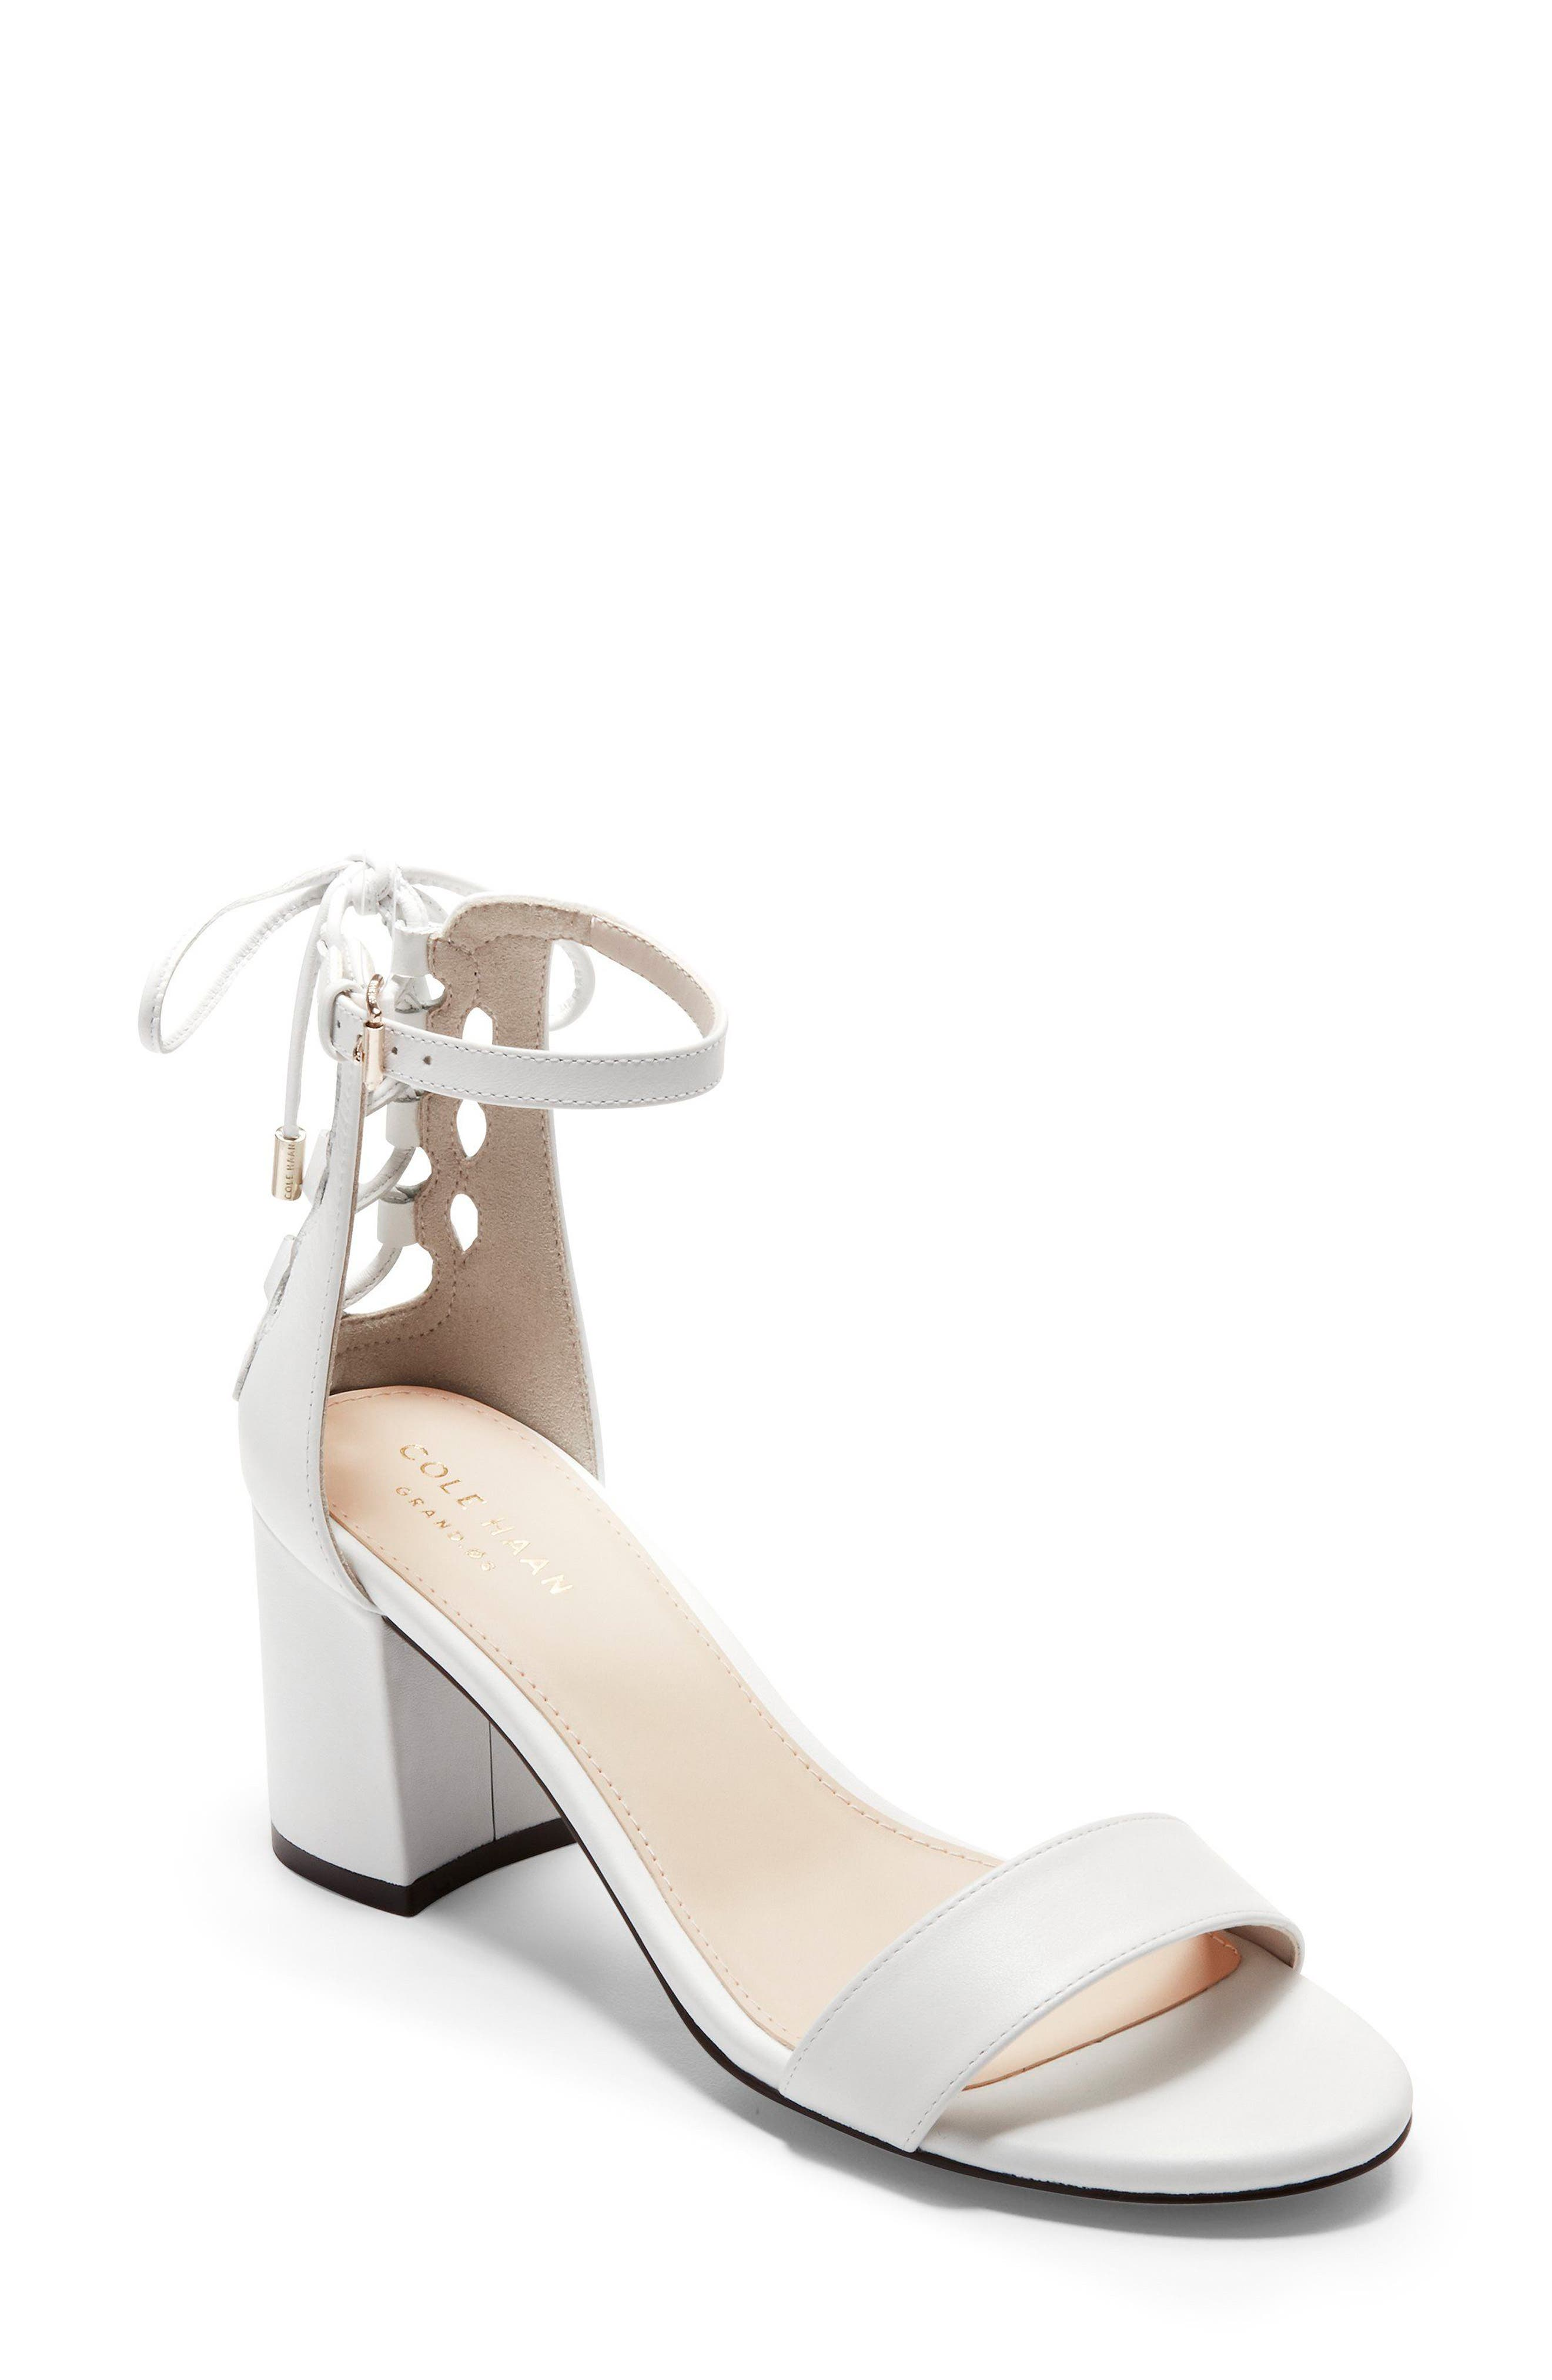 Leah Sandal,                         Main,                         color, White Leather